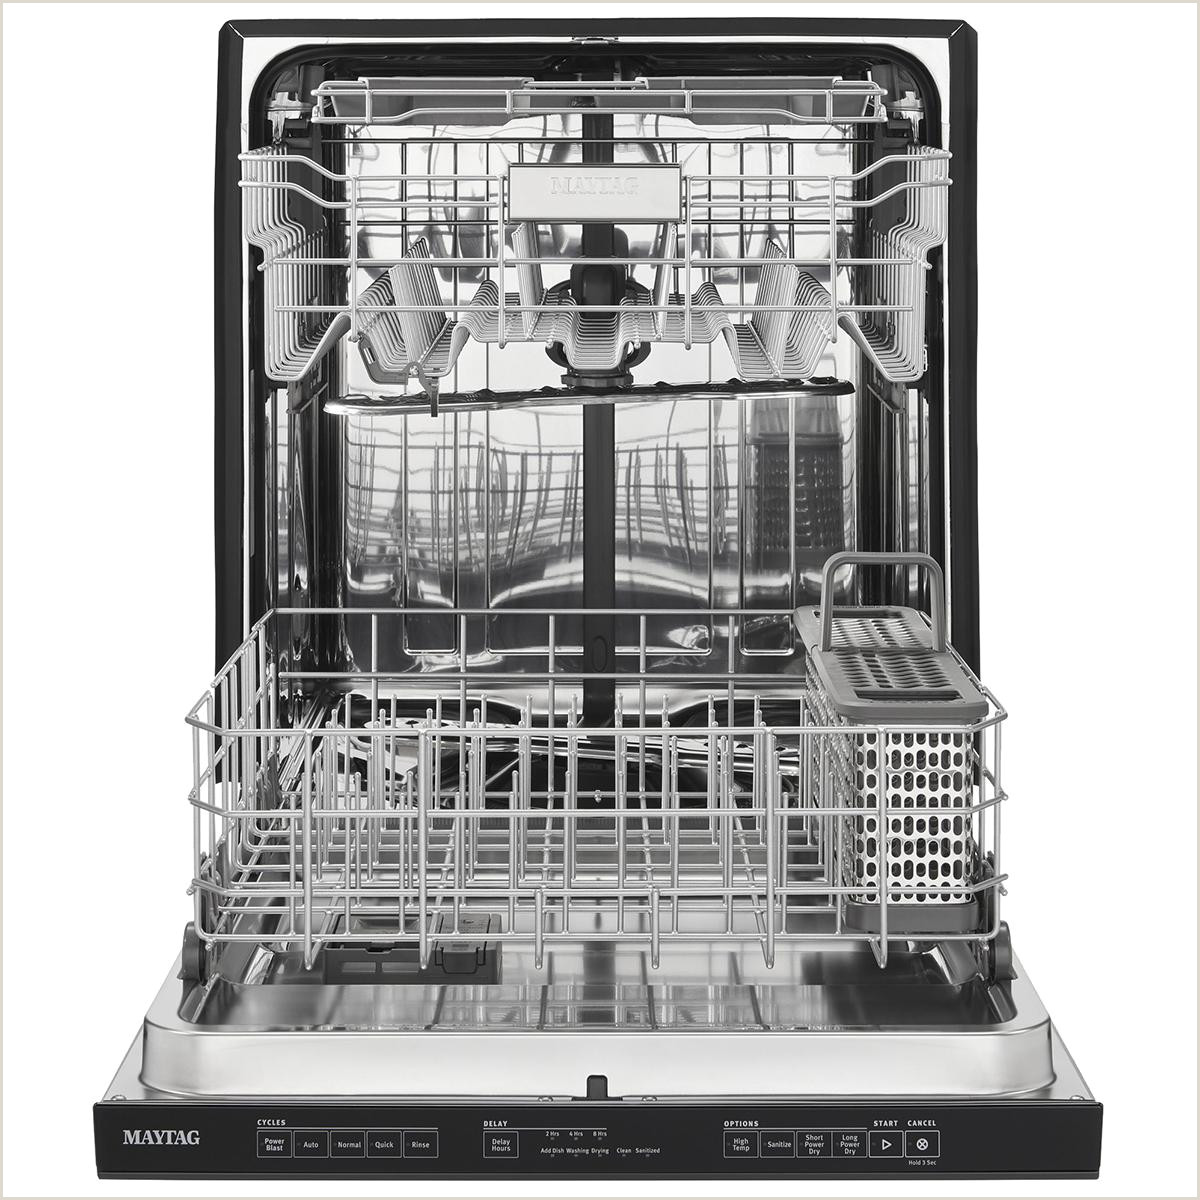 Maytag Built In Dishwasher in Black